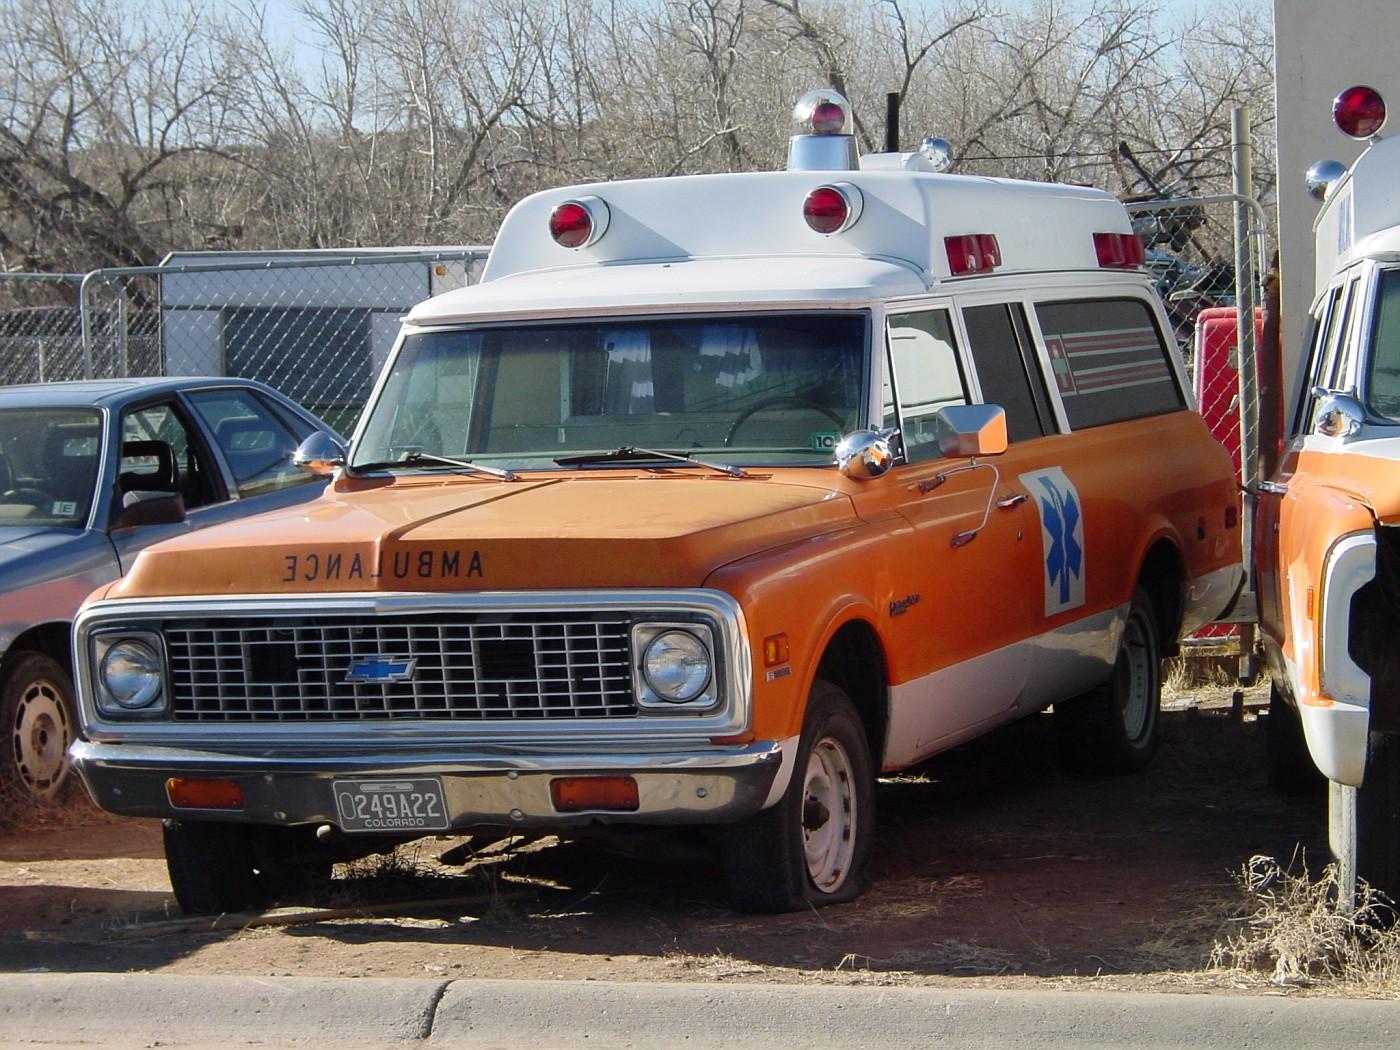 CO - Chevy ambulance (72) in a Colorado boneyard